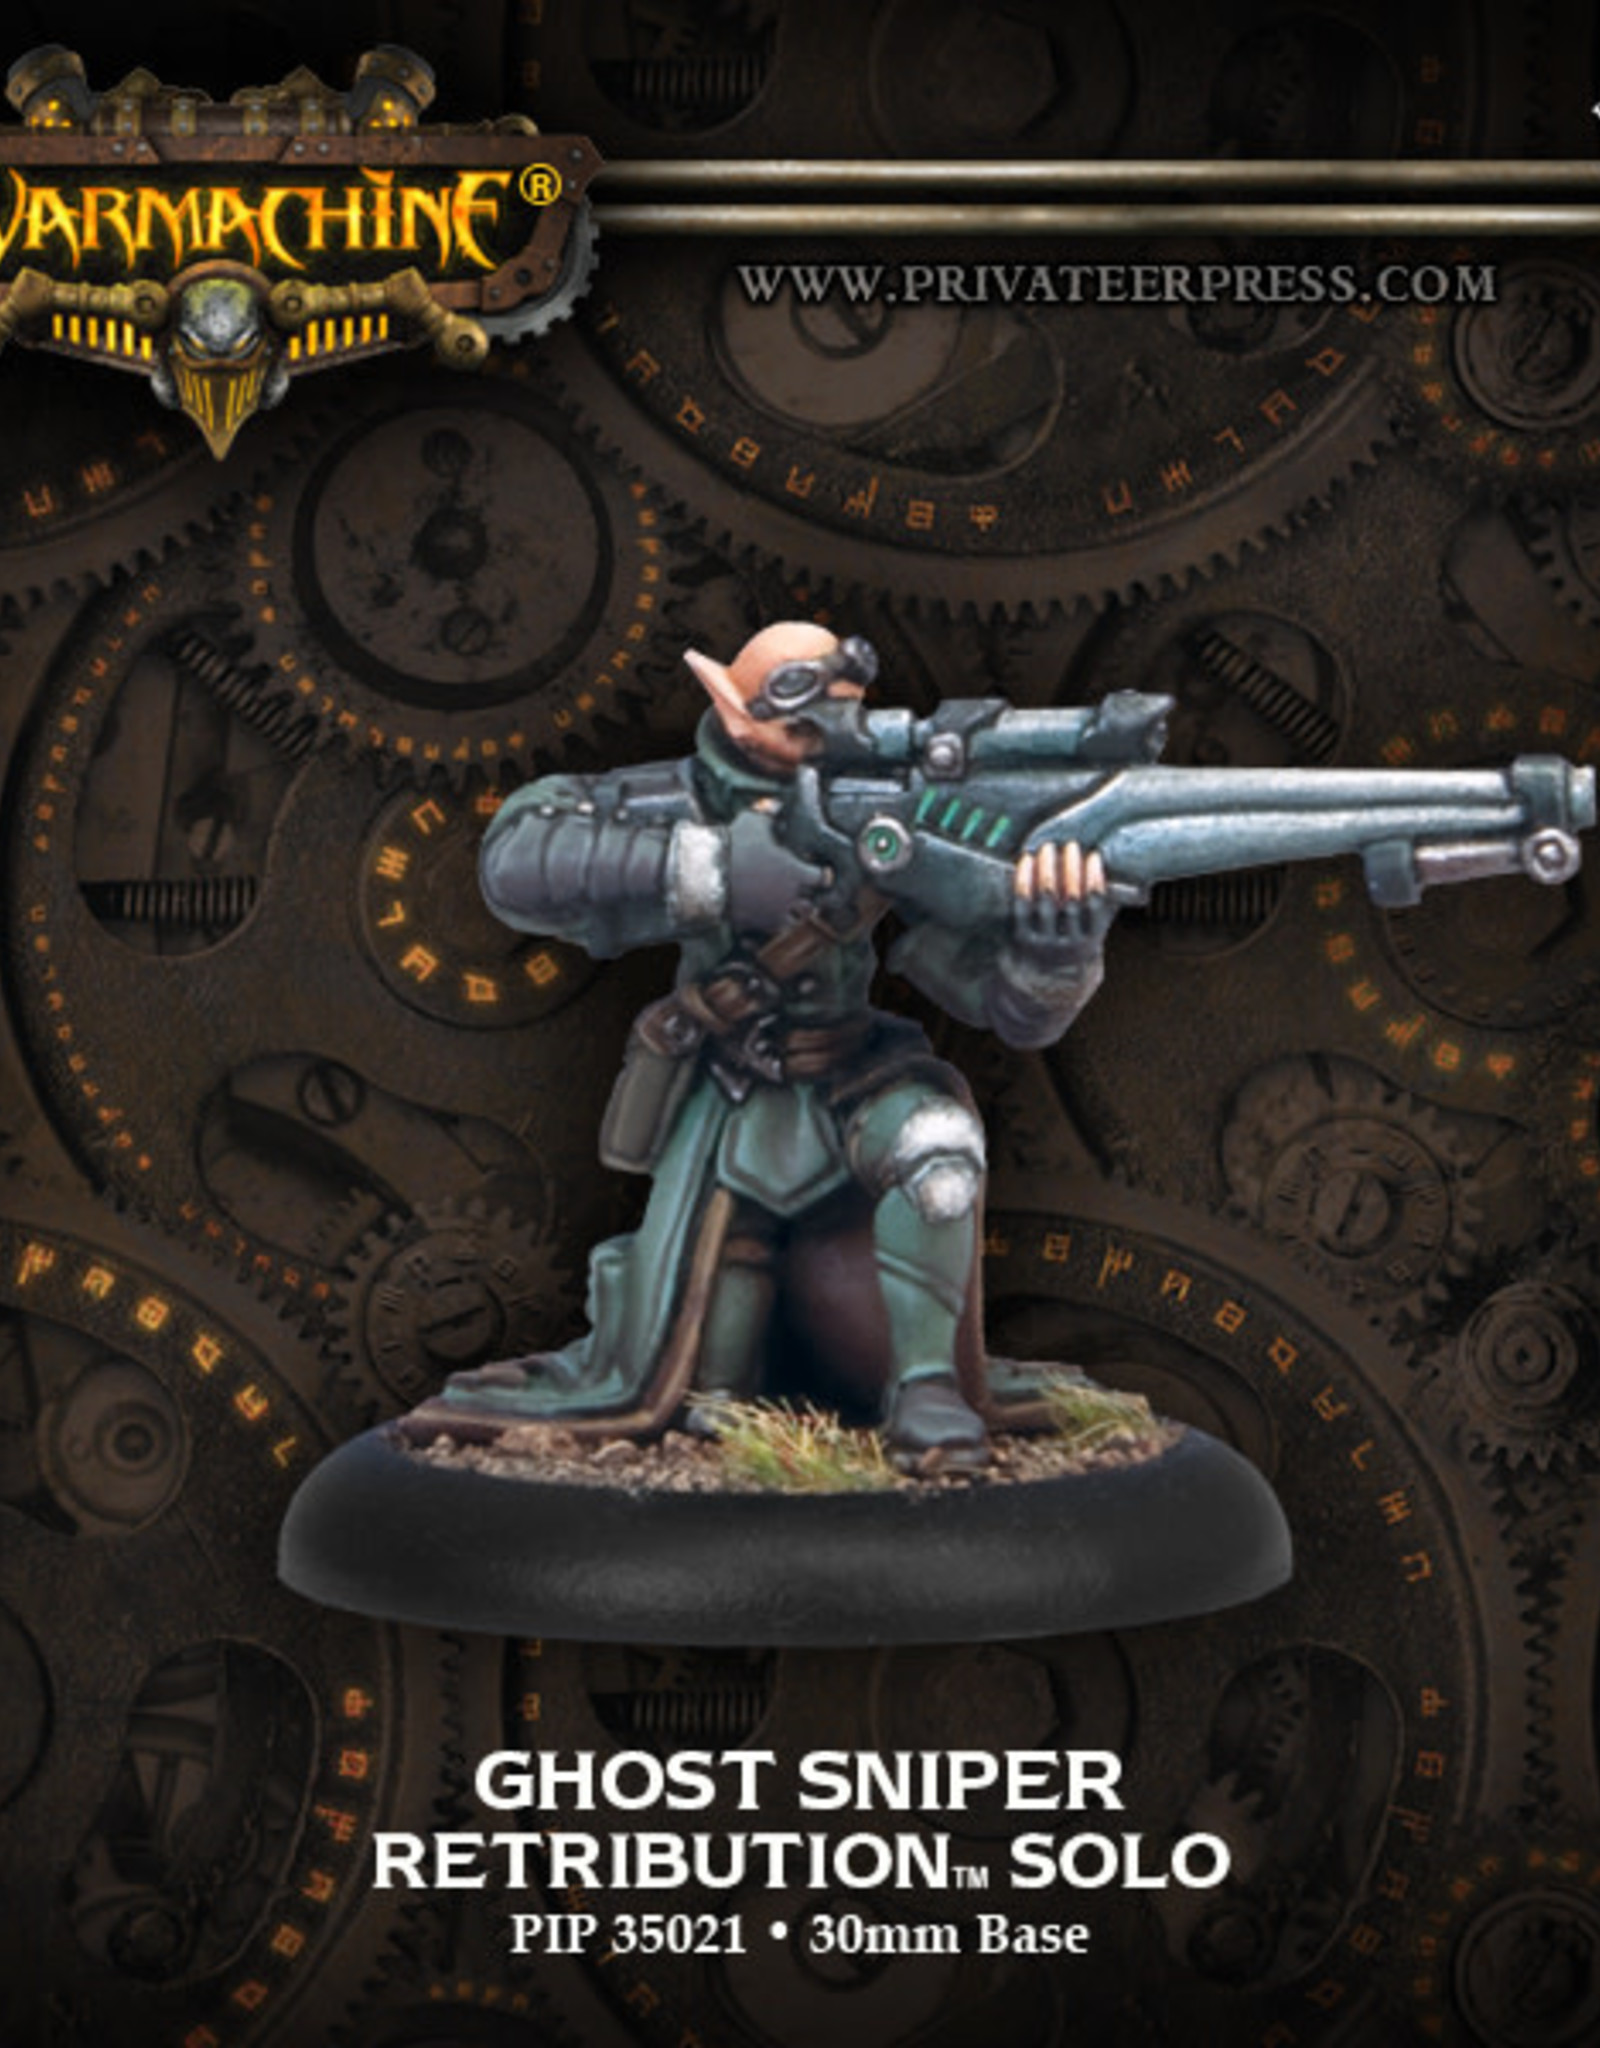 Warmachine Scyrah - Ghost Sniper